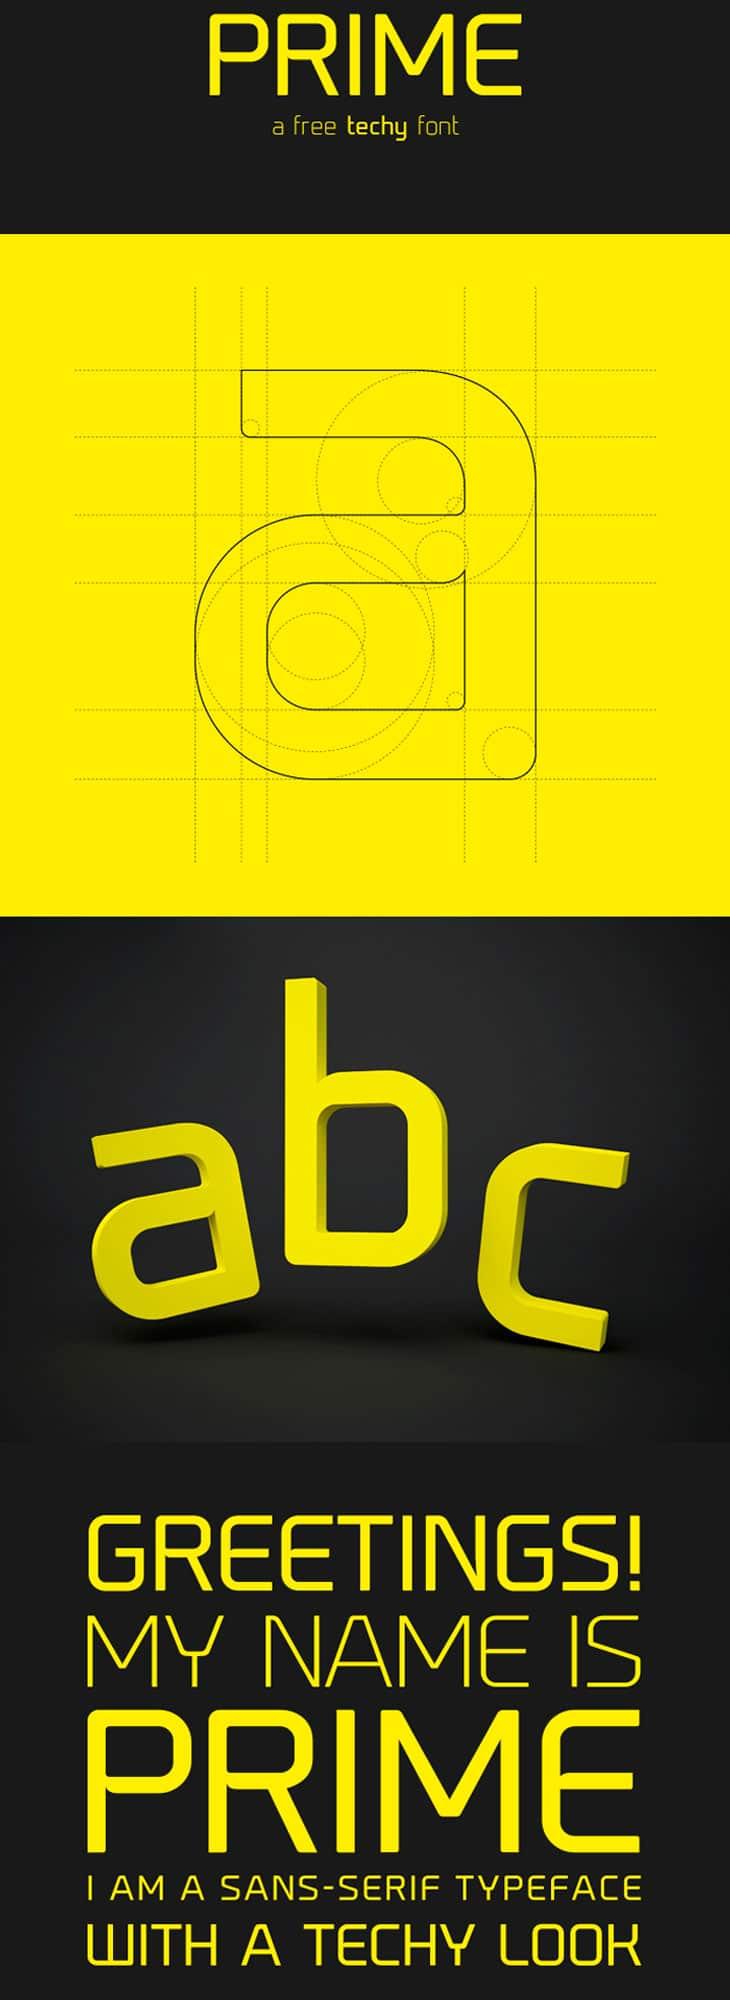 Prime-free-font